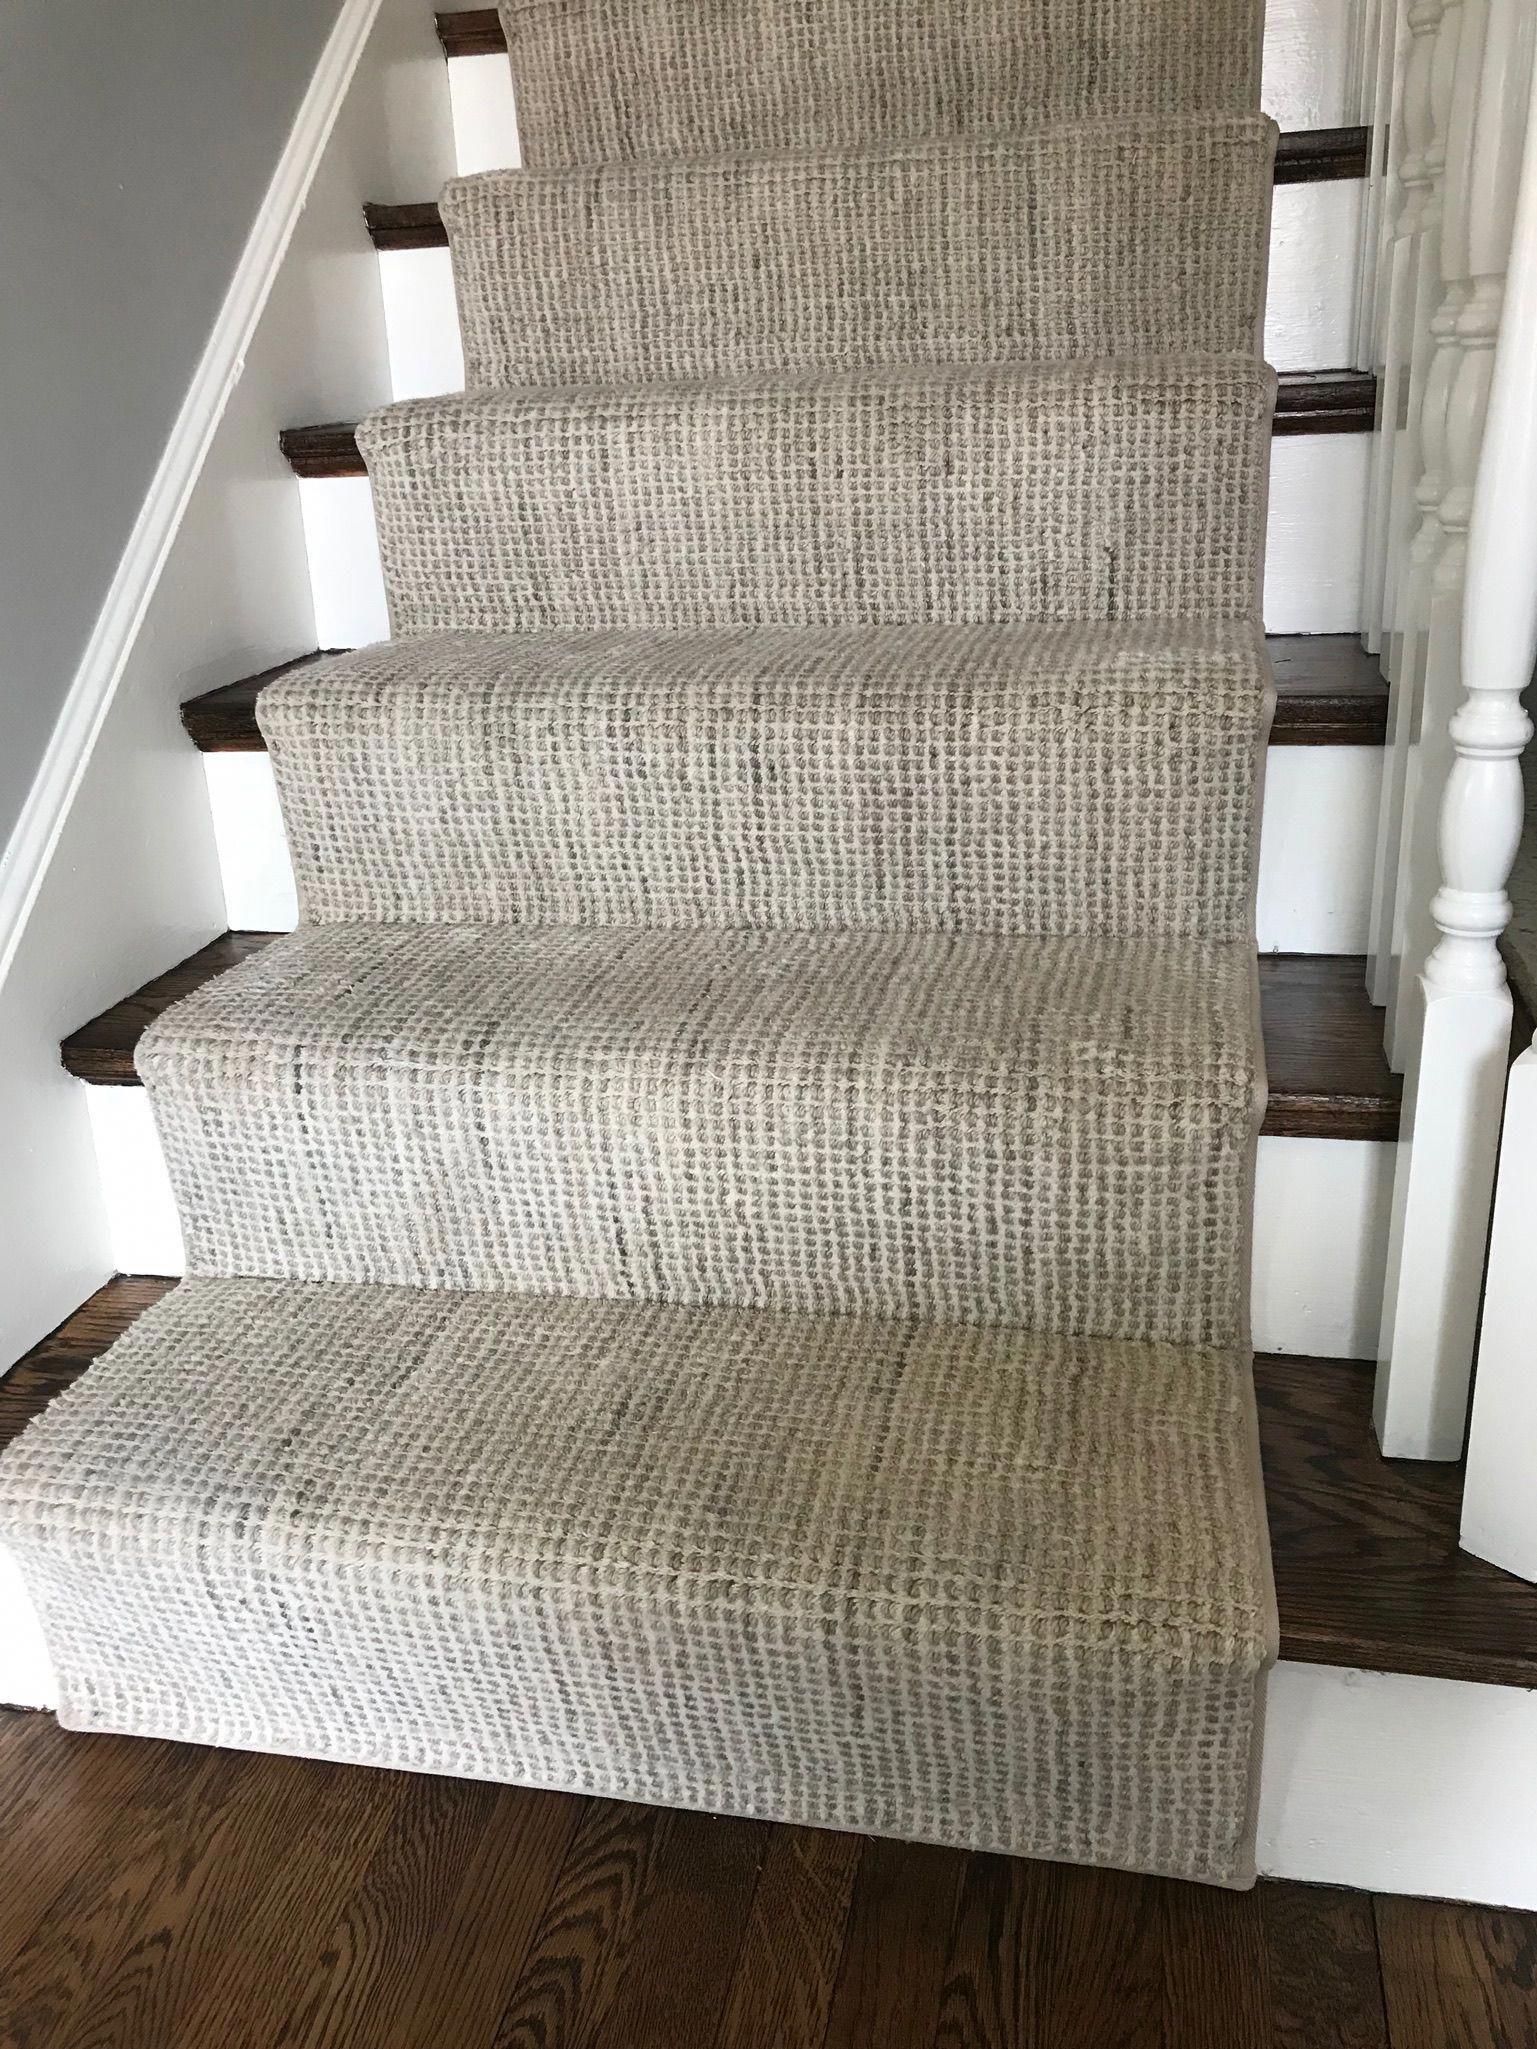 Best Carpet Runners For Sale Melbourne Carpetrunnersbytheyard 640 x 480